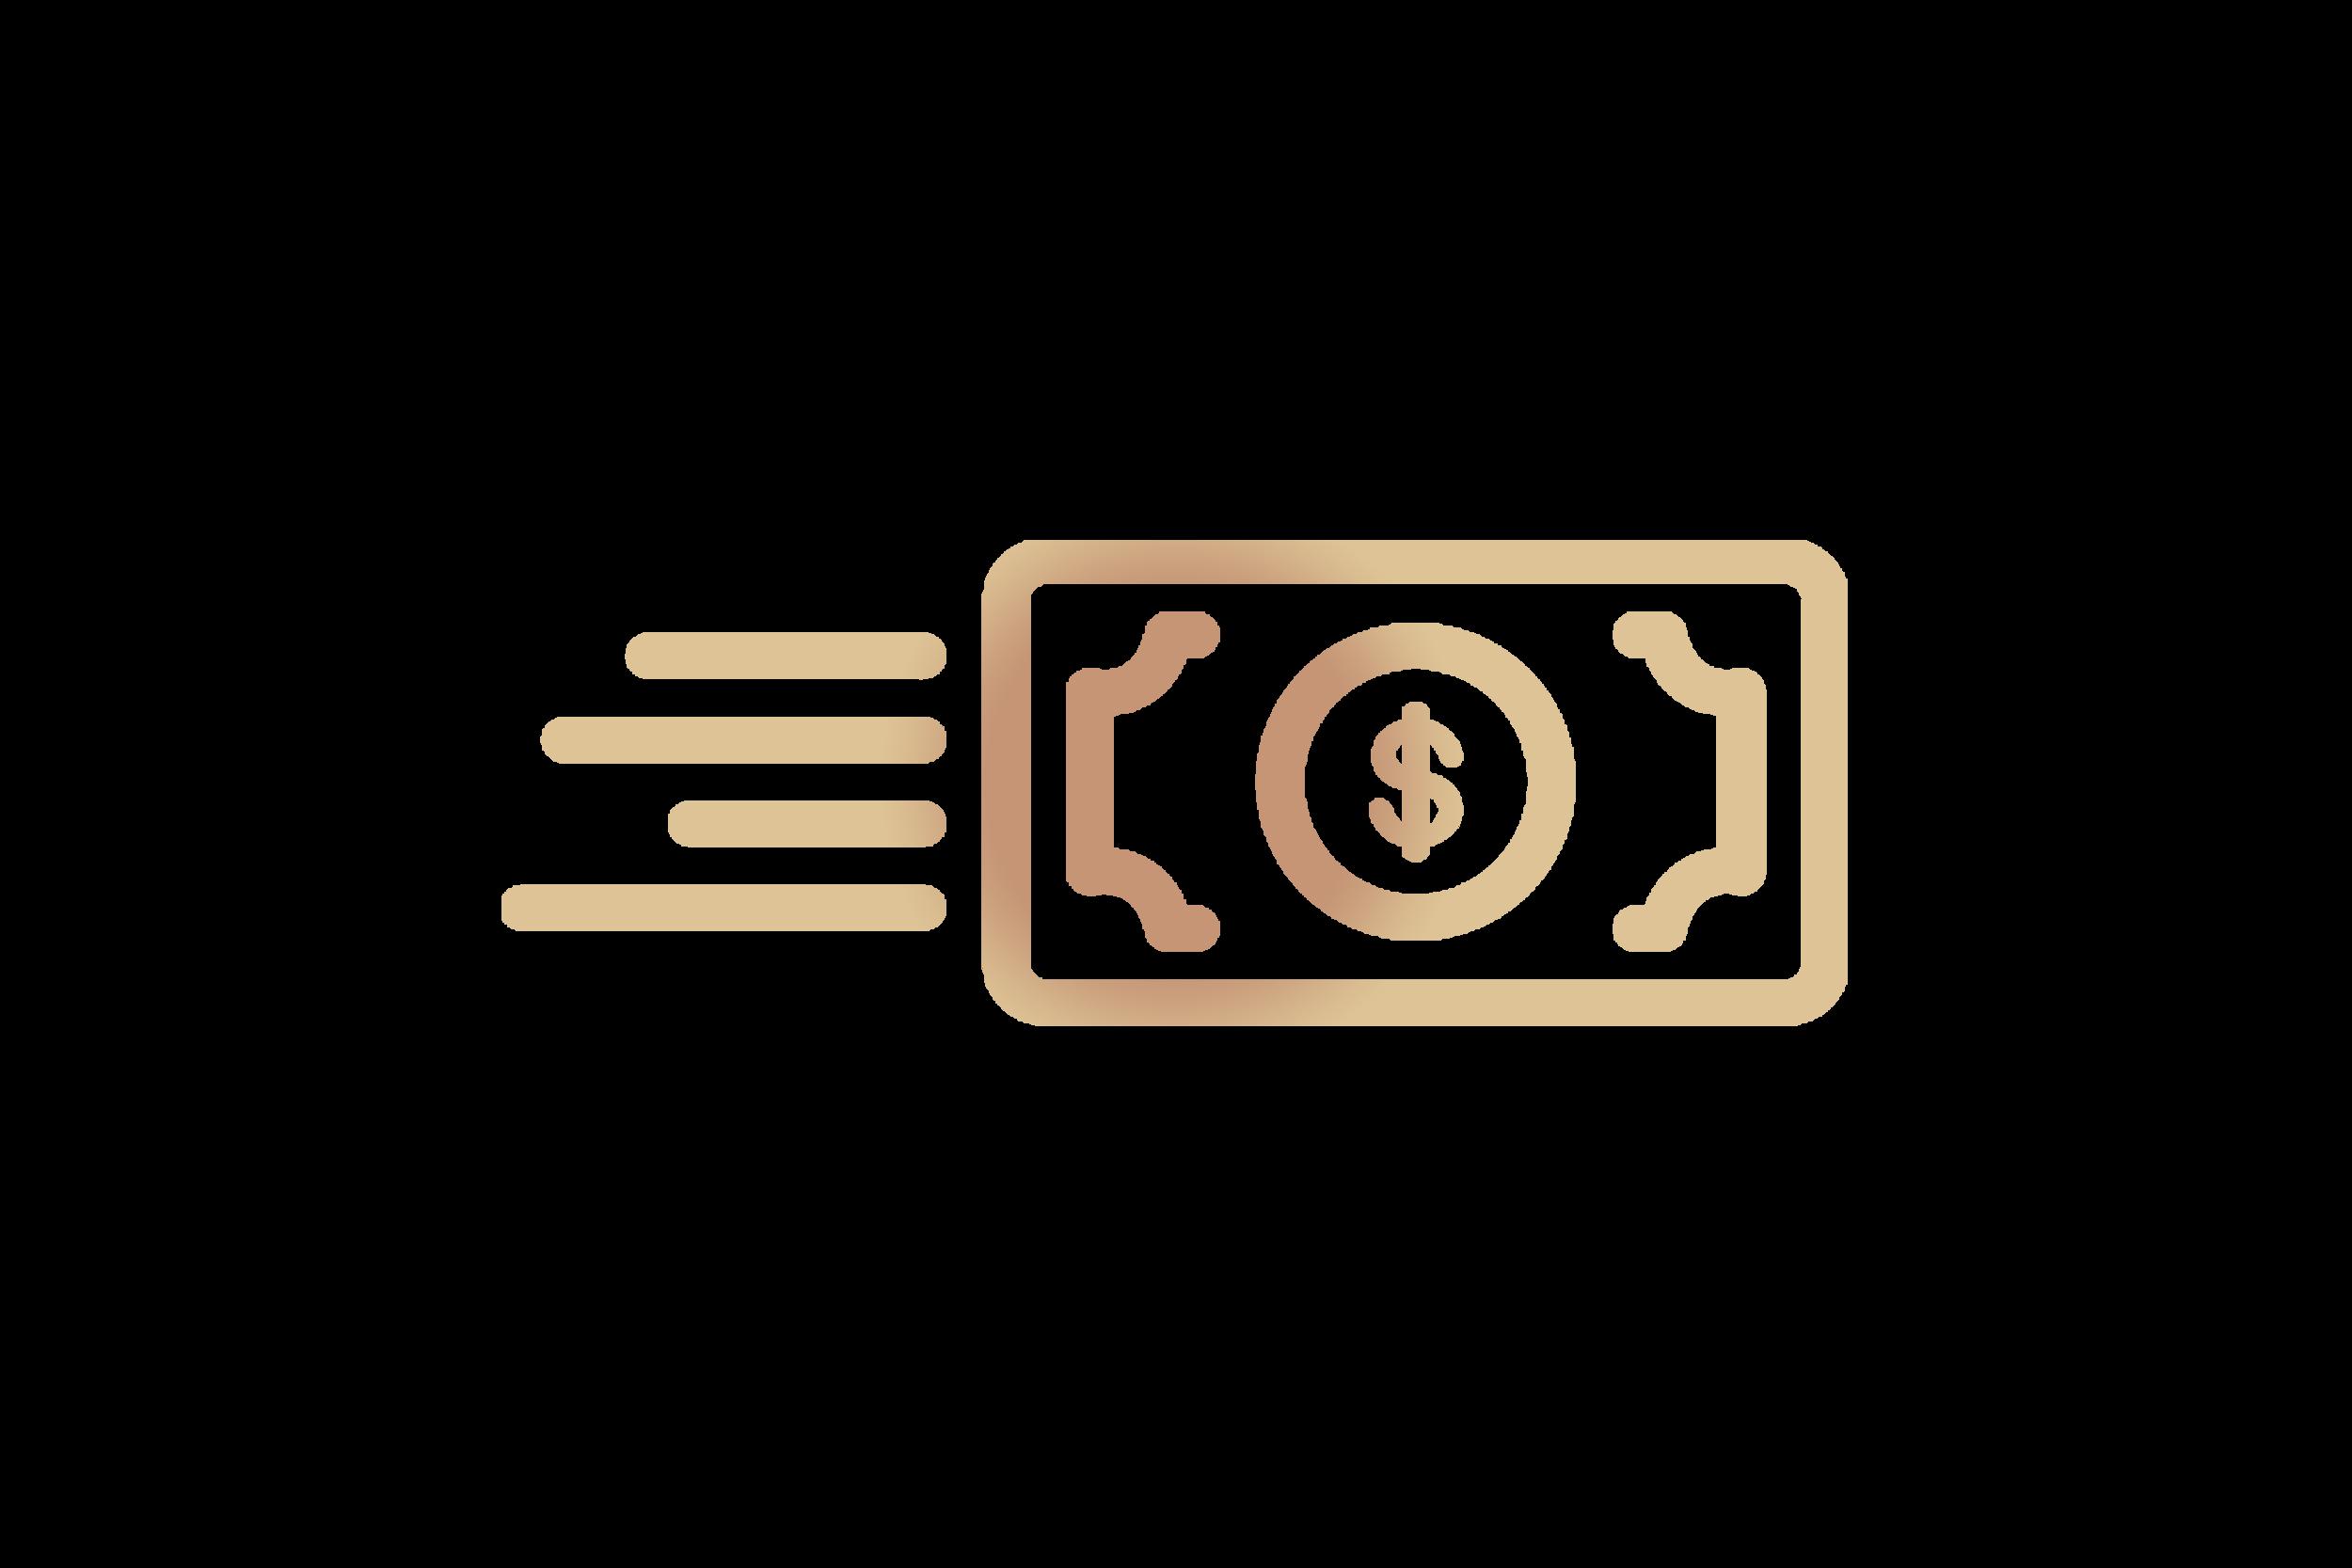 kauno-payments-01.png